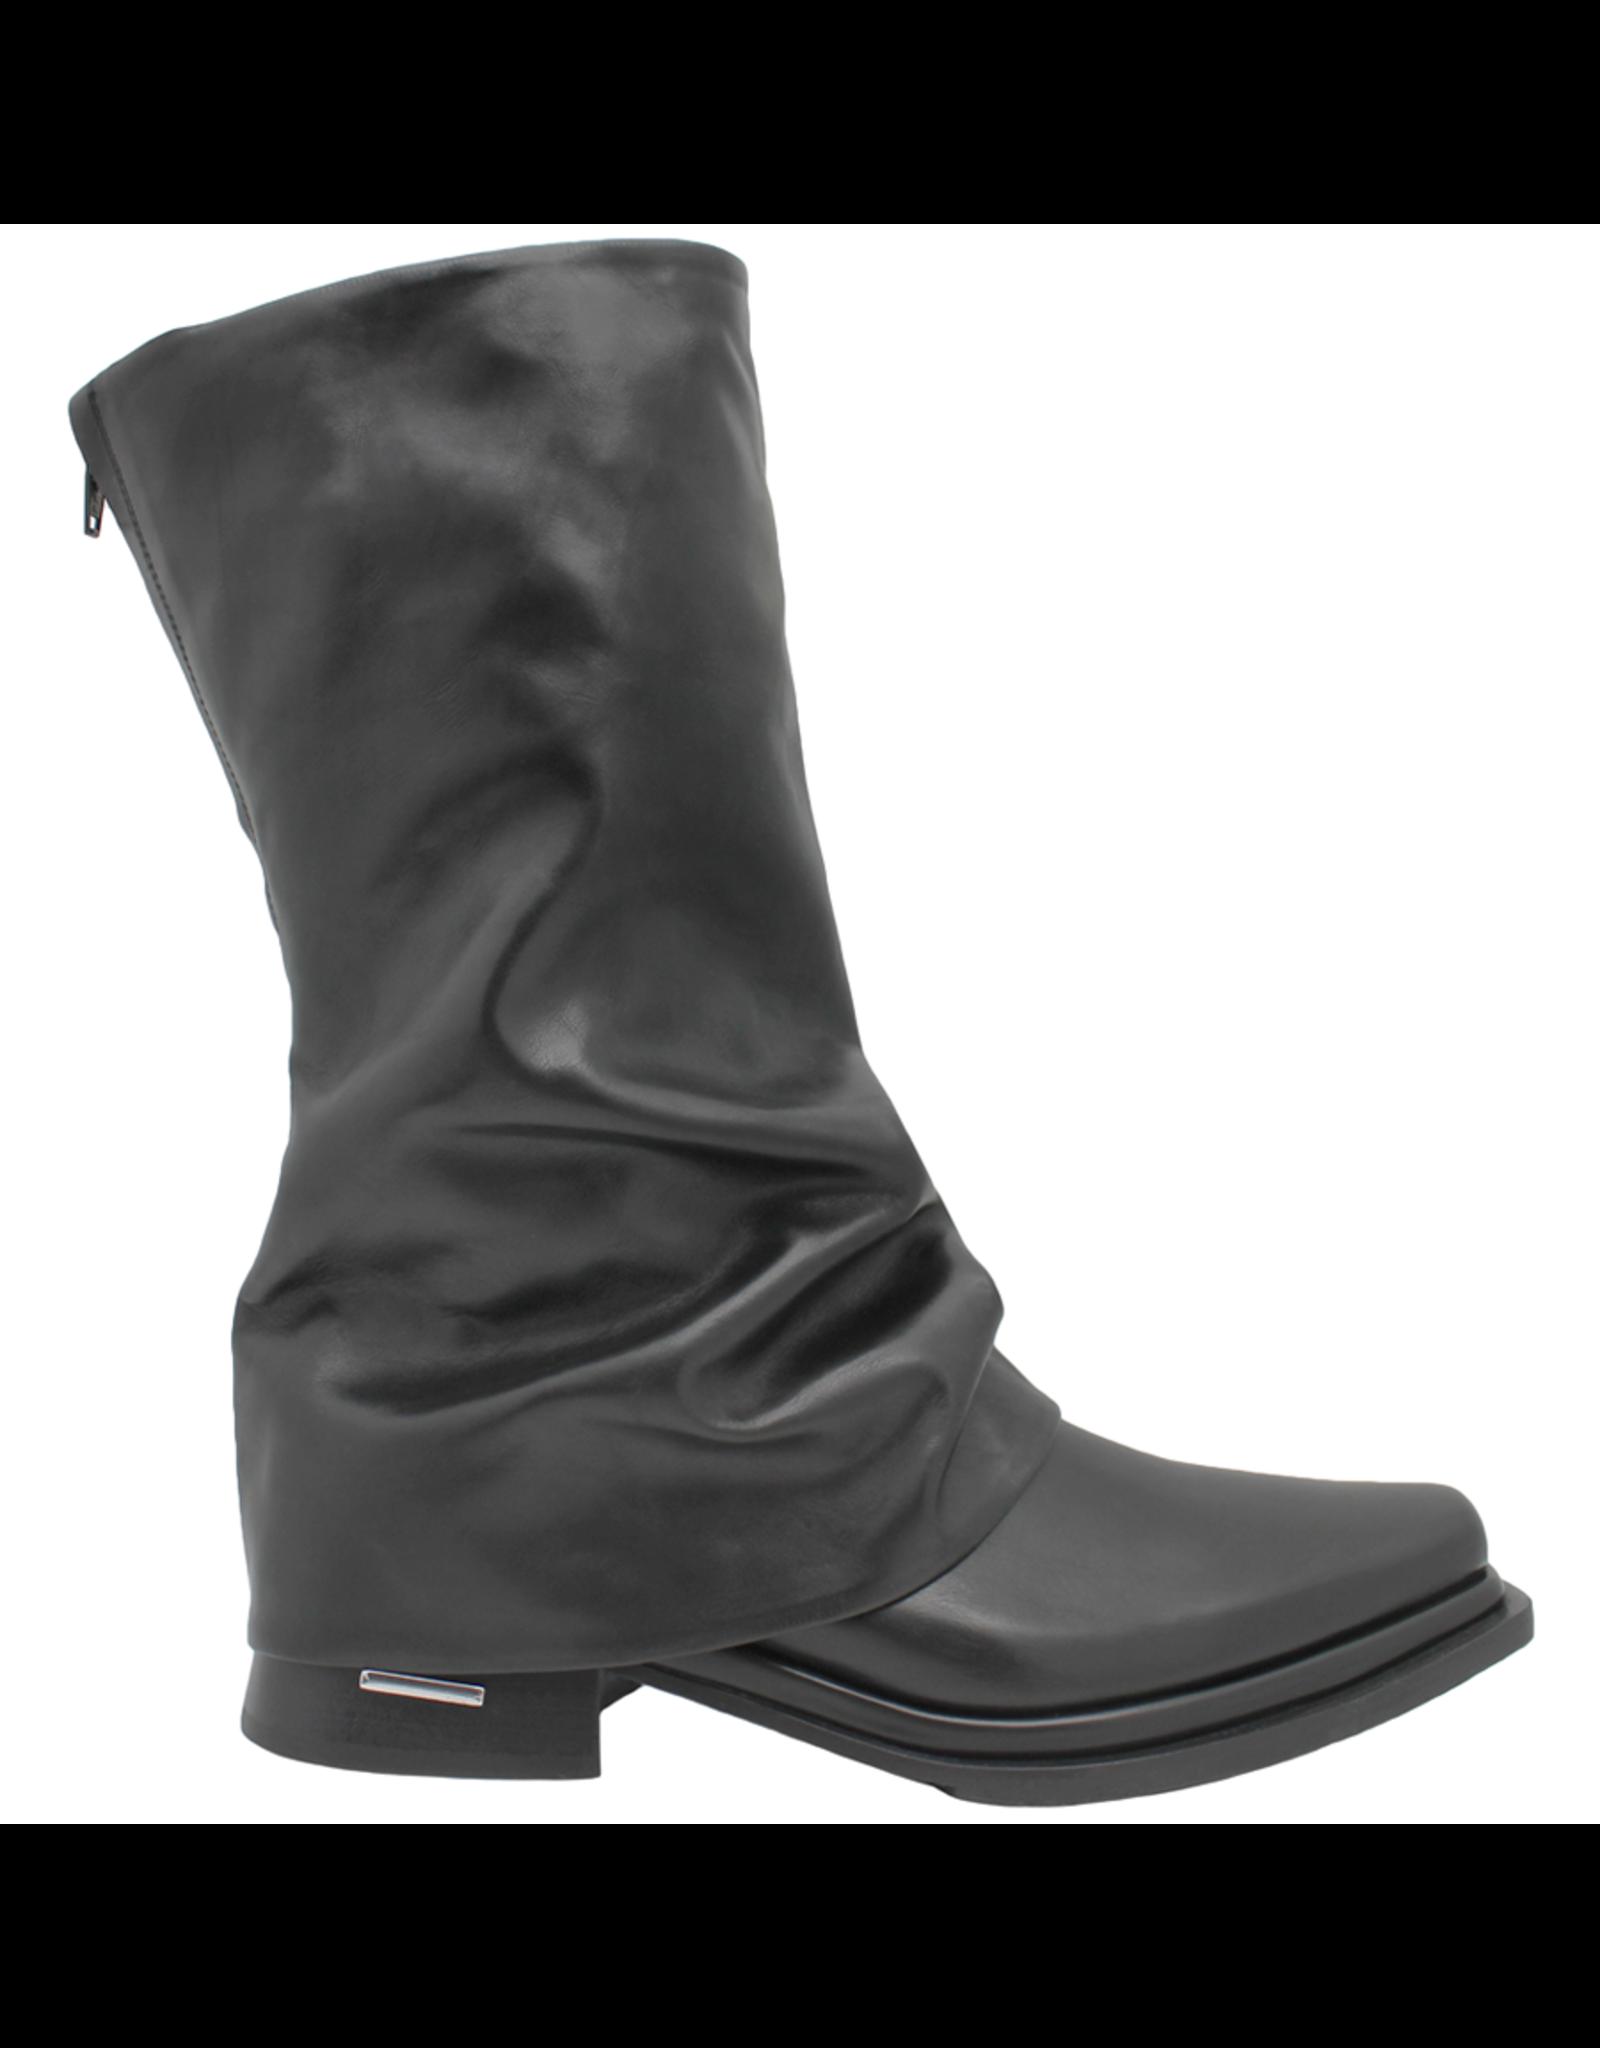 Ixos Ixos Black Point Toe Cuff Boot 1553